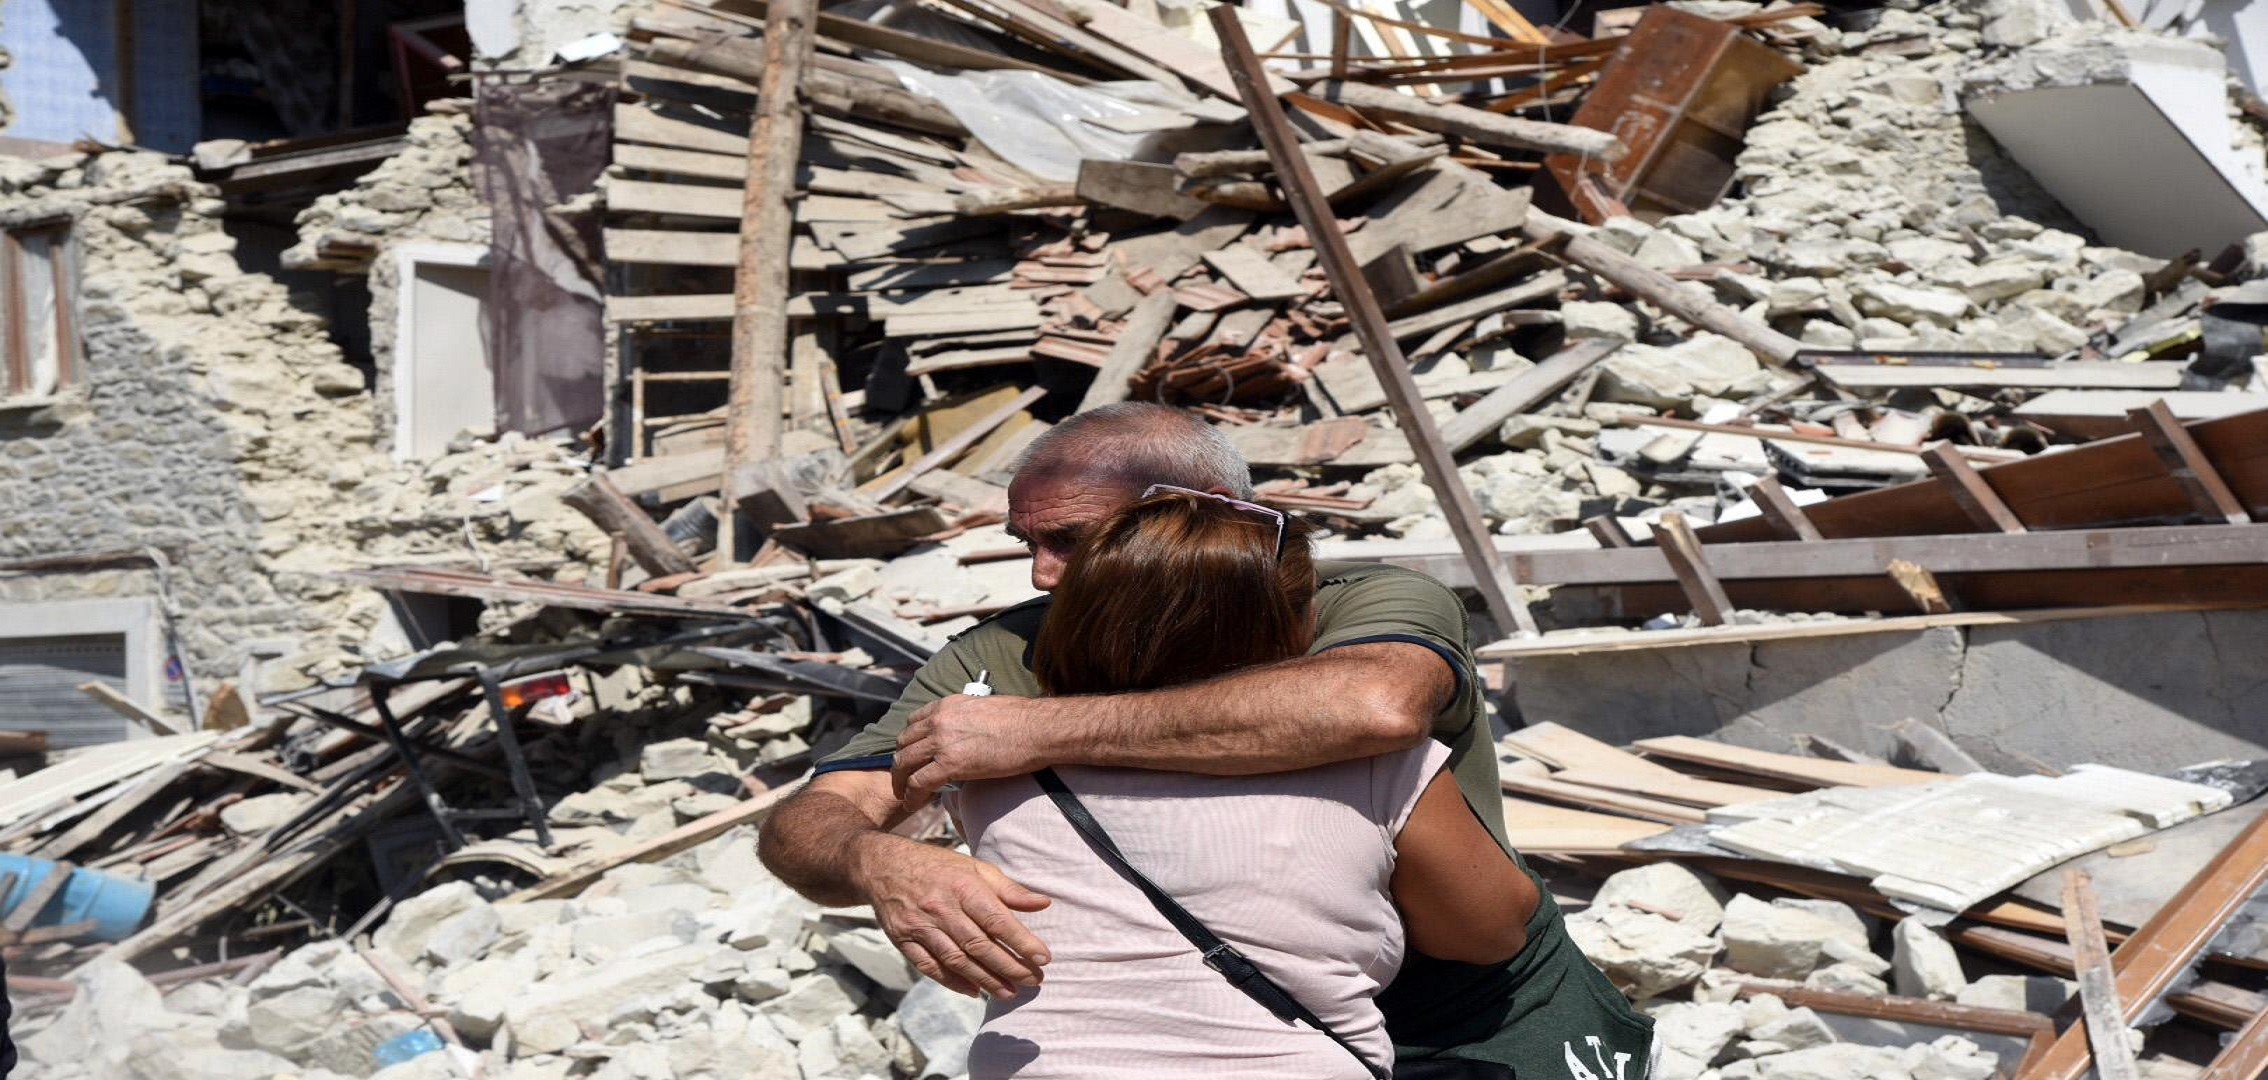 terremoto-abbraccio-140x100.jpg